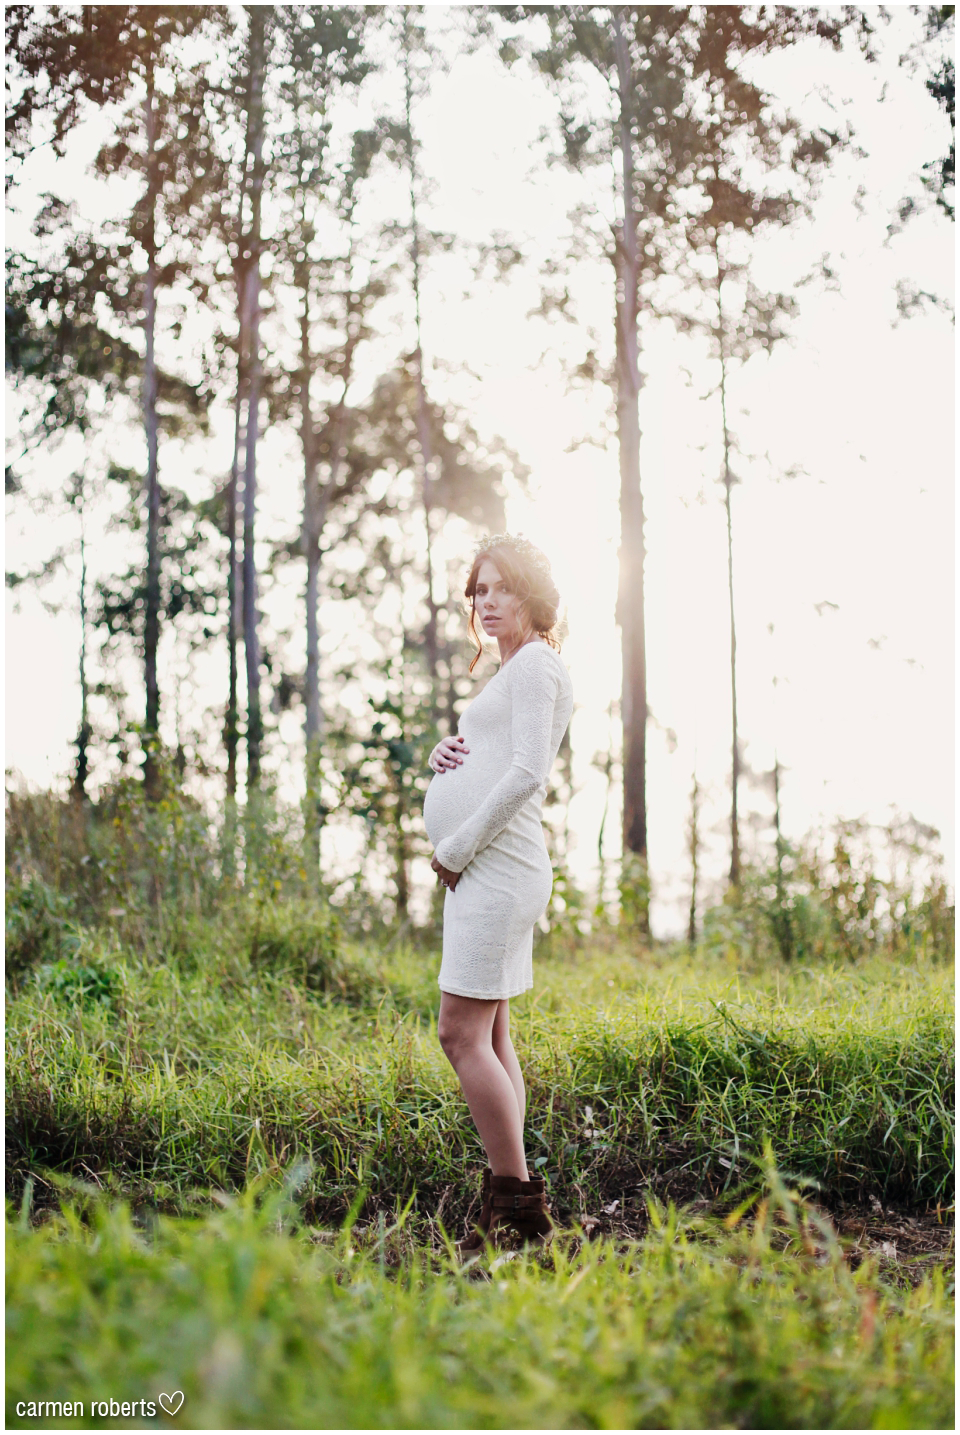 Carmen Roberts Photography, Tasmin